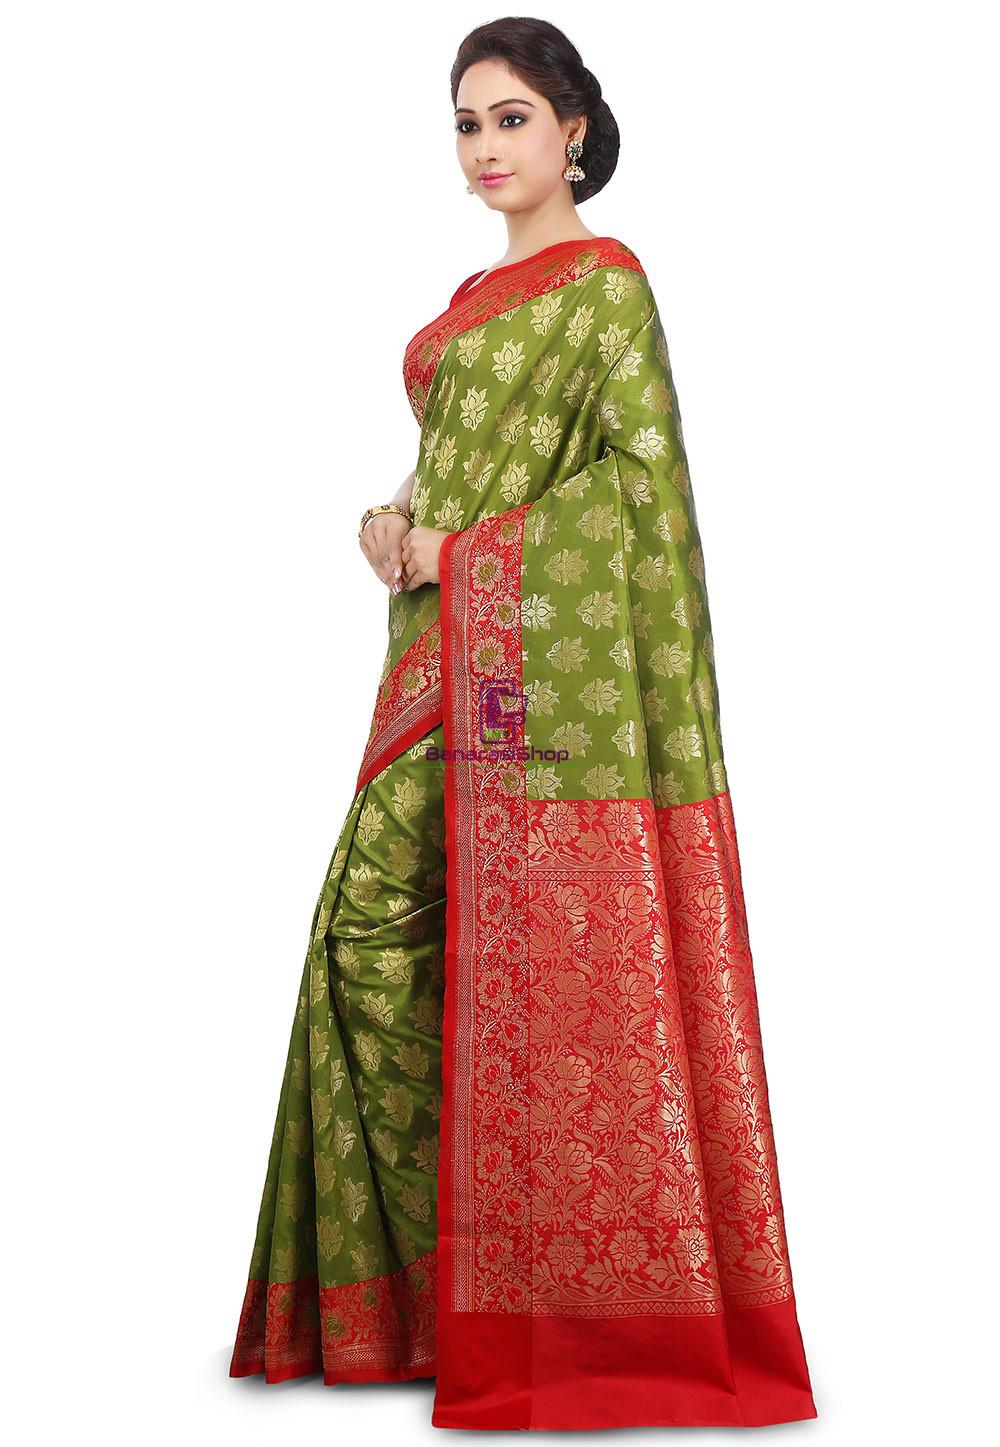 Woven Banarasi Art Silk Saree in Olive Green and Red 6